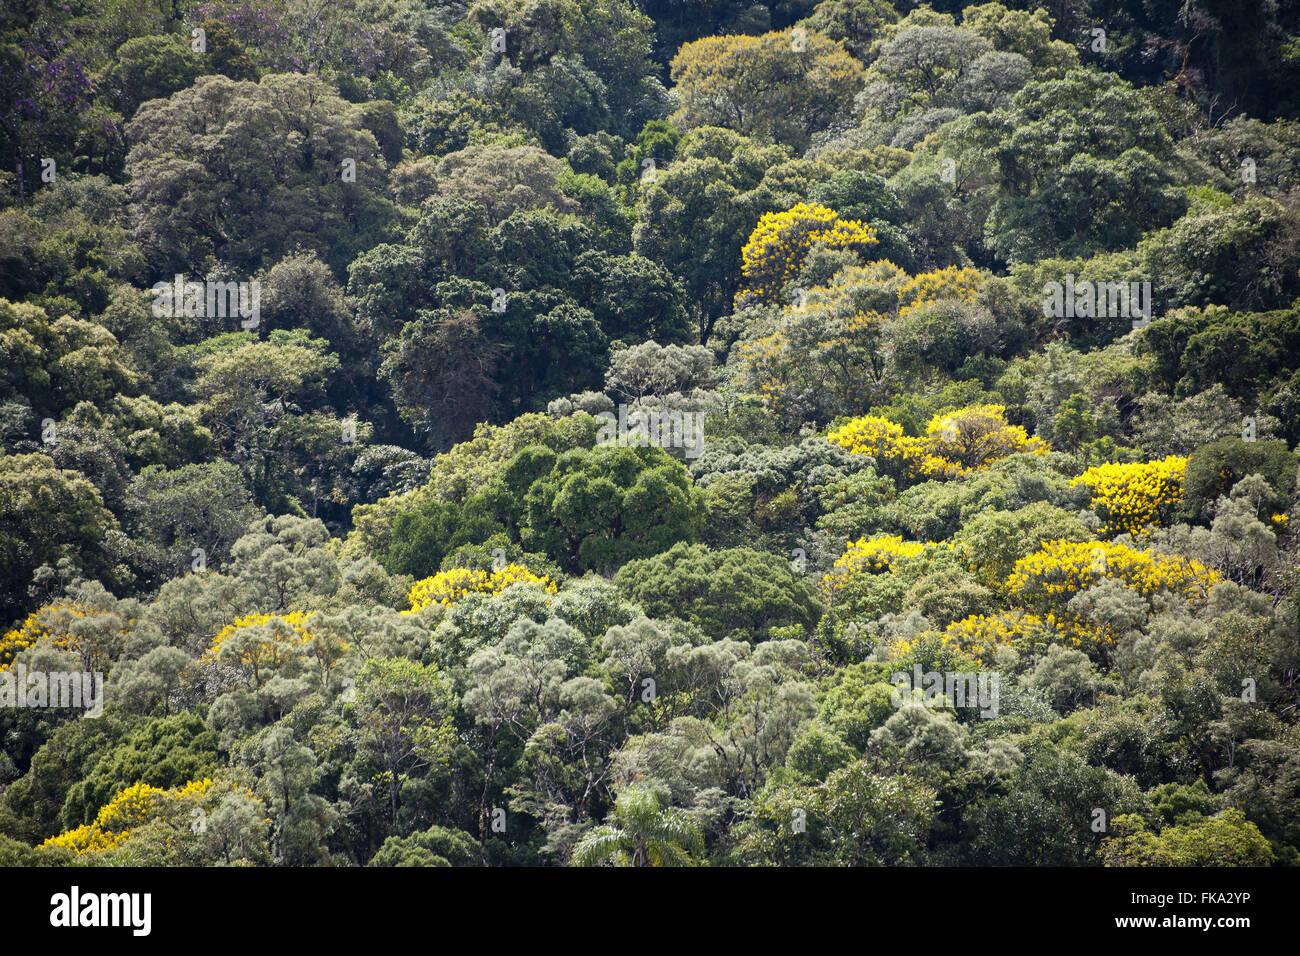 Acacias in the rain forest - Acacia farnesiana - Stock Image